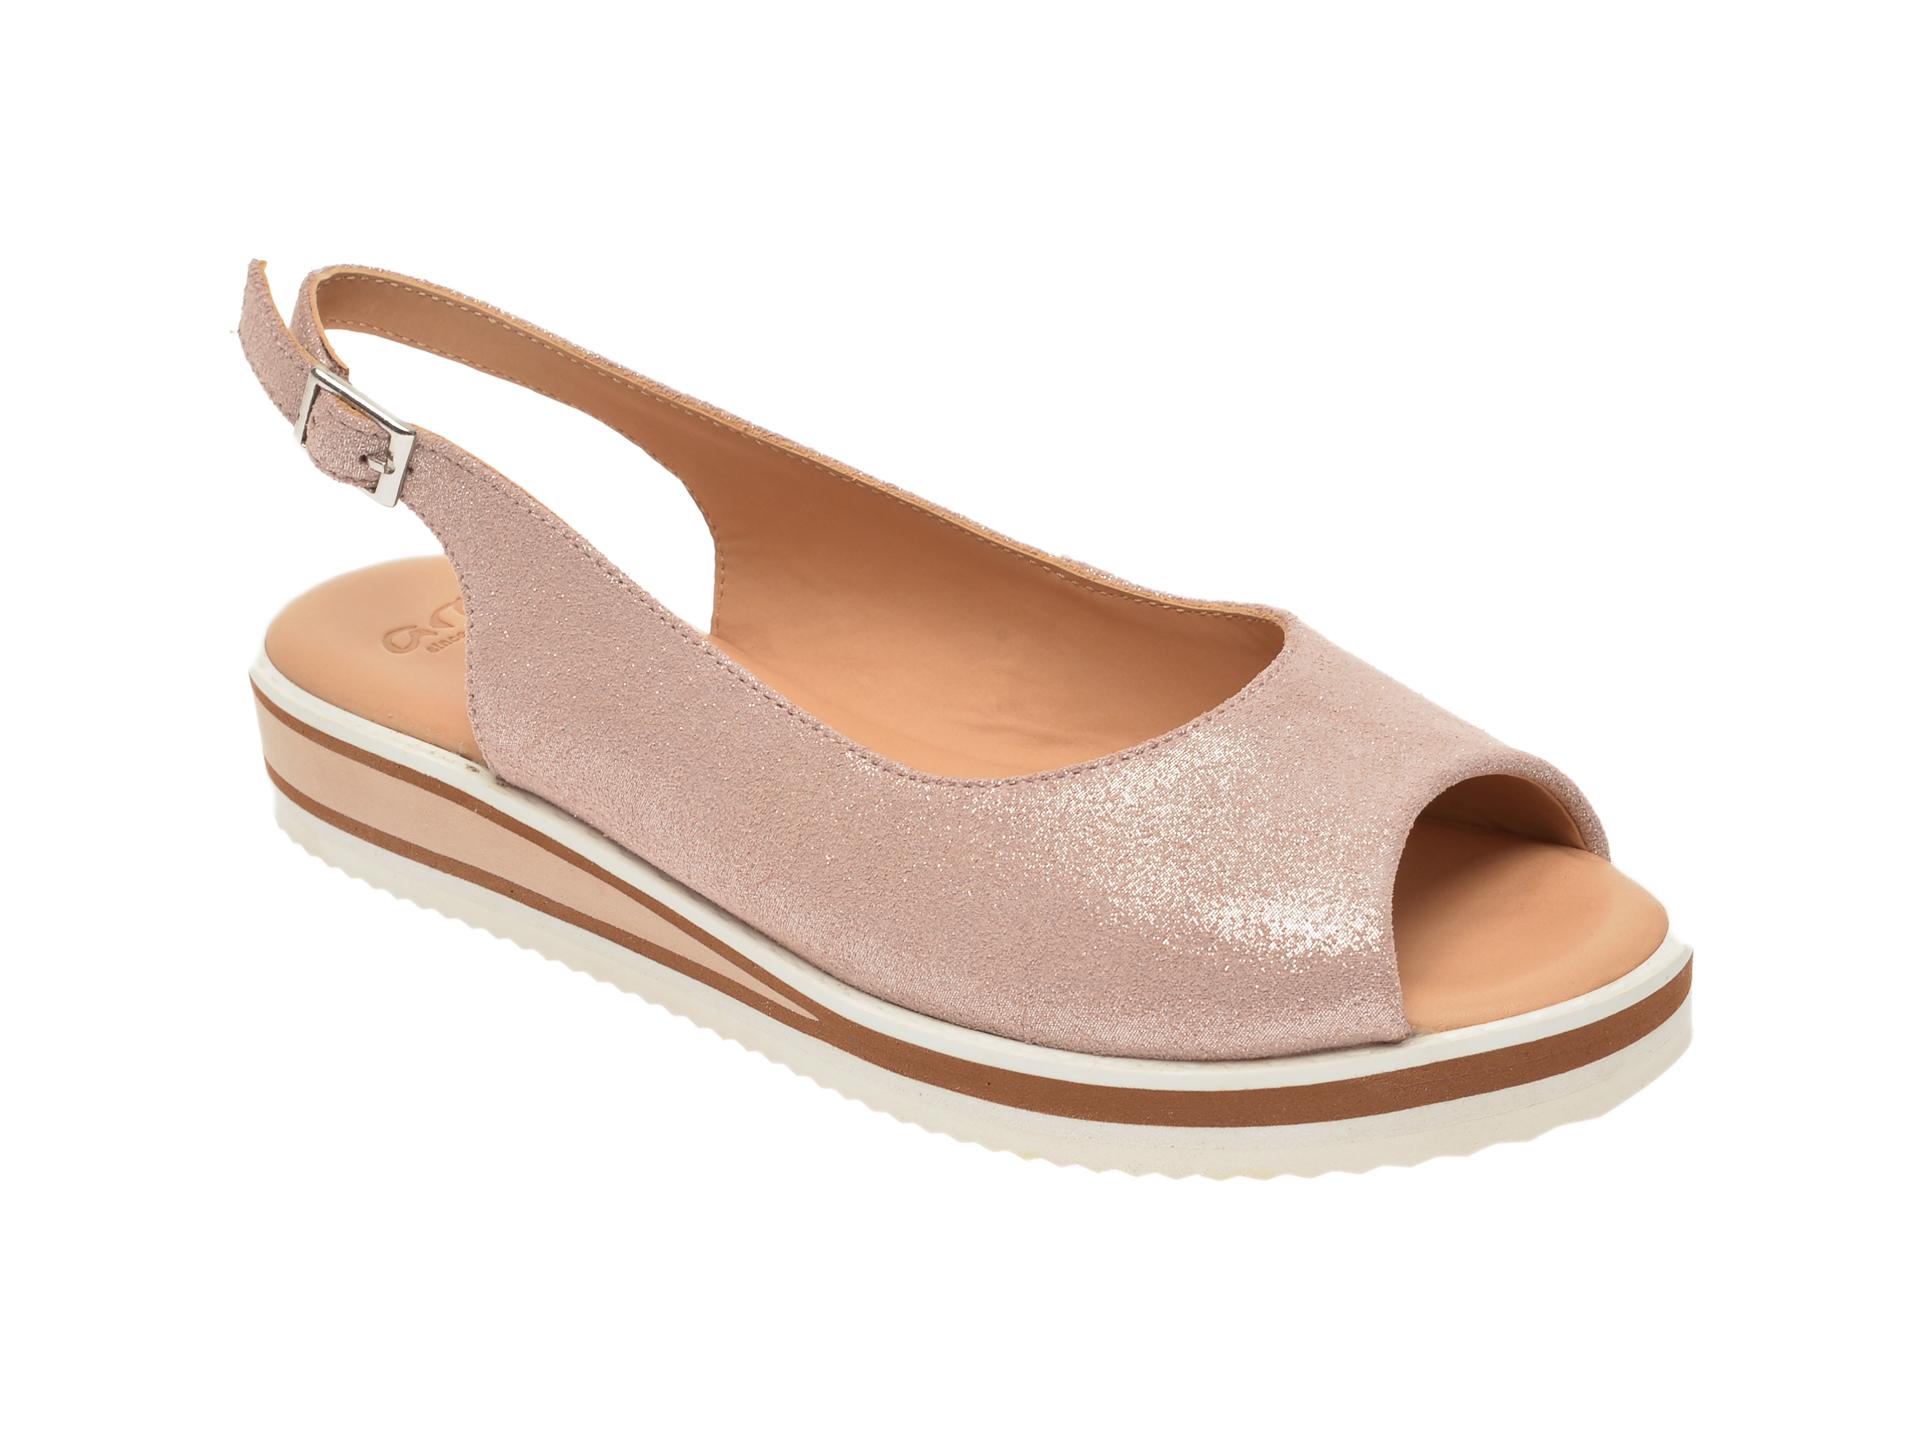 Sandale ARA roz, 14740, din piele intoarsa